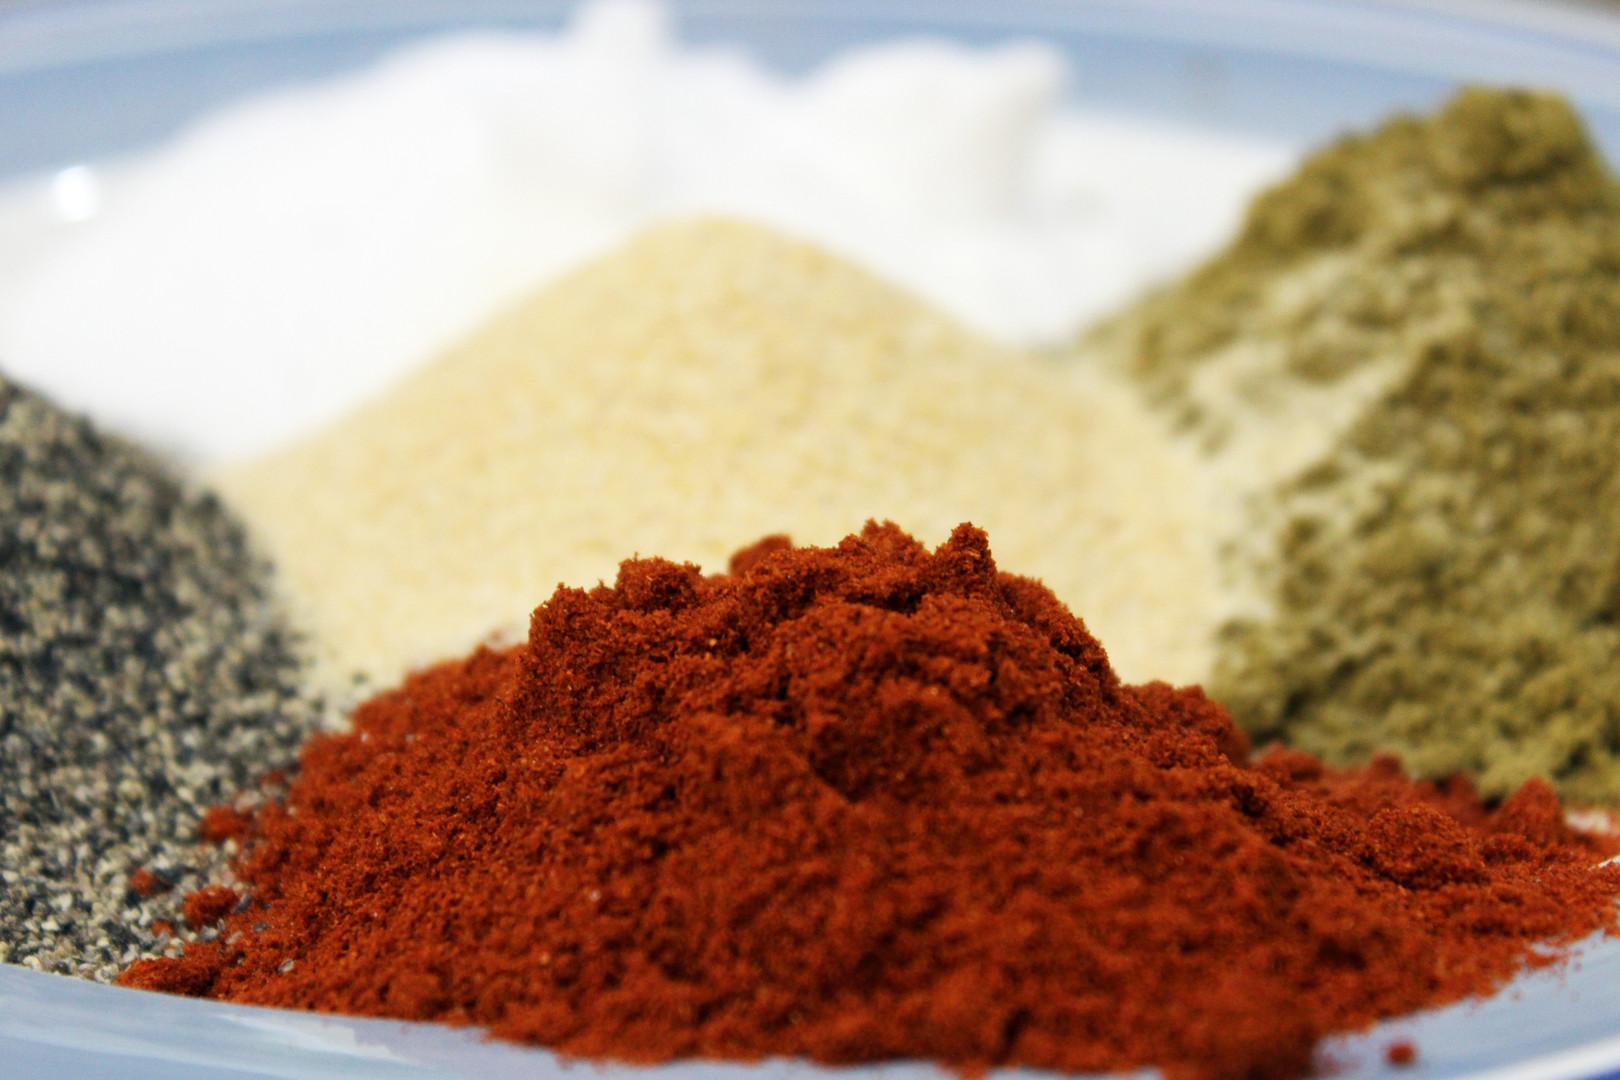 DonTaco_restaurant_flavors_17_spices.jpg